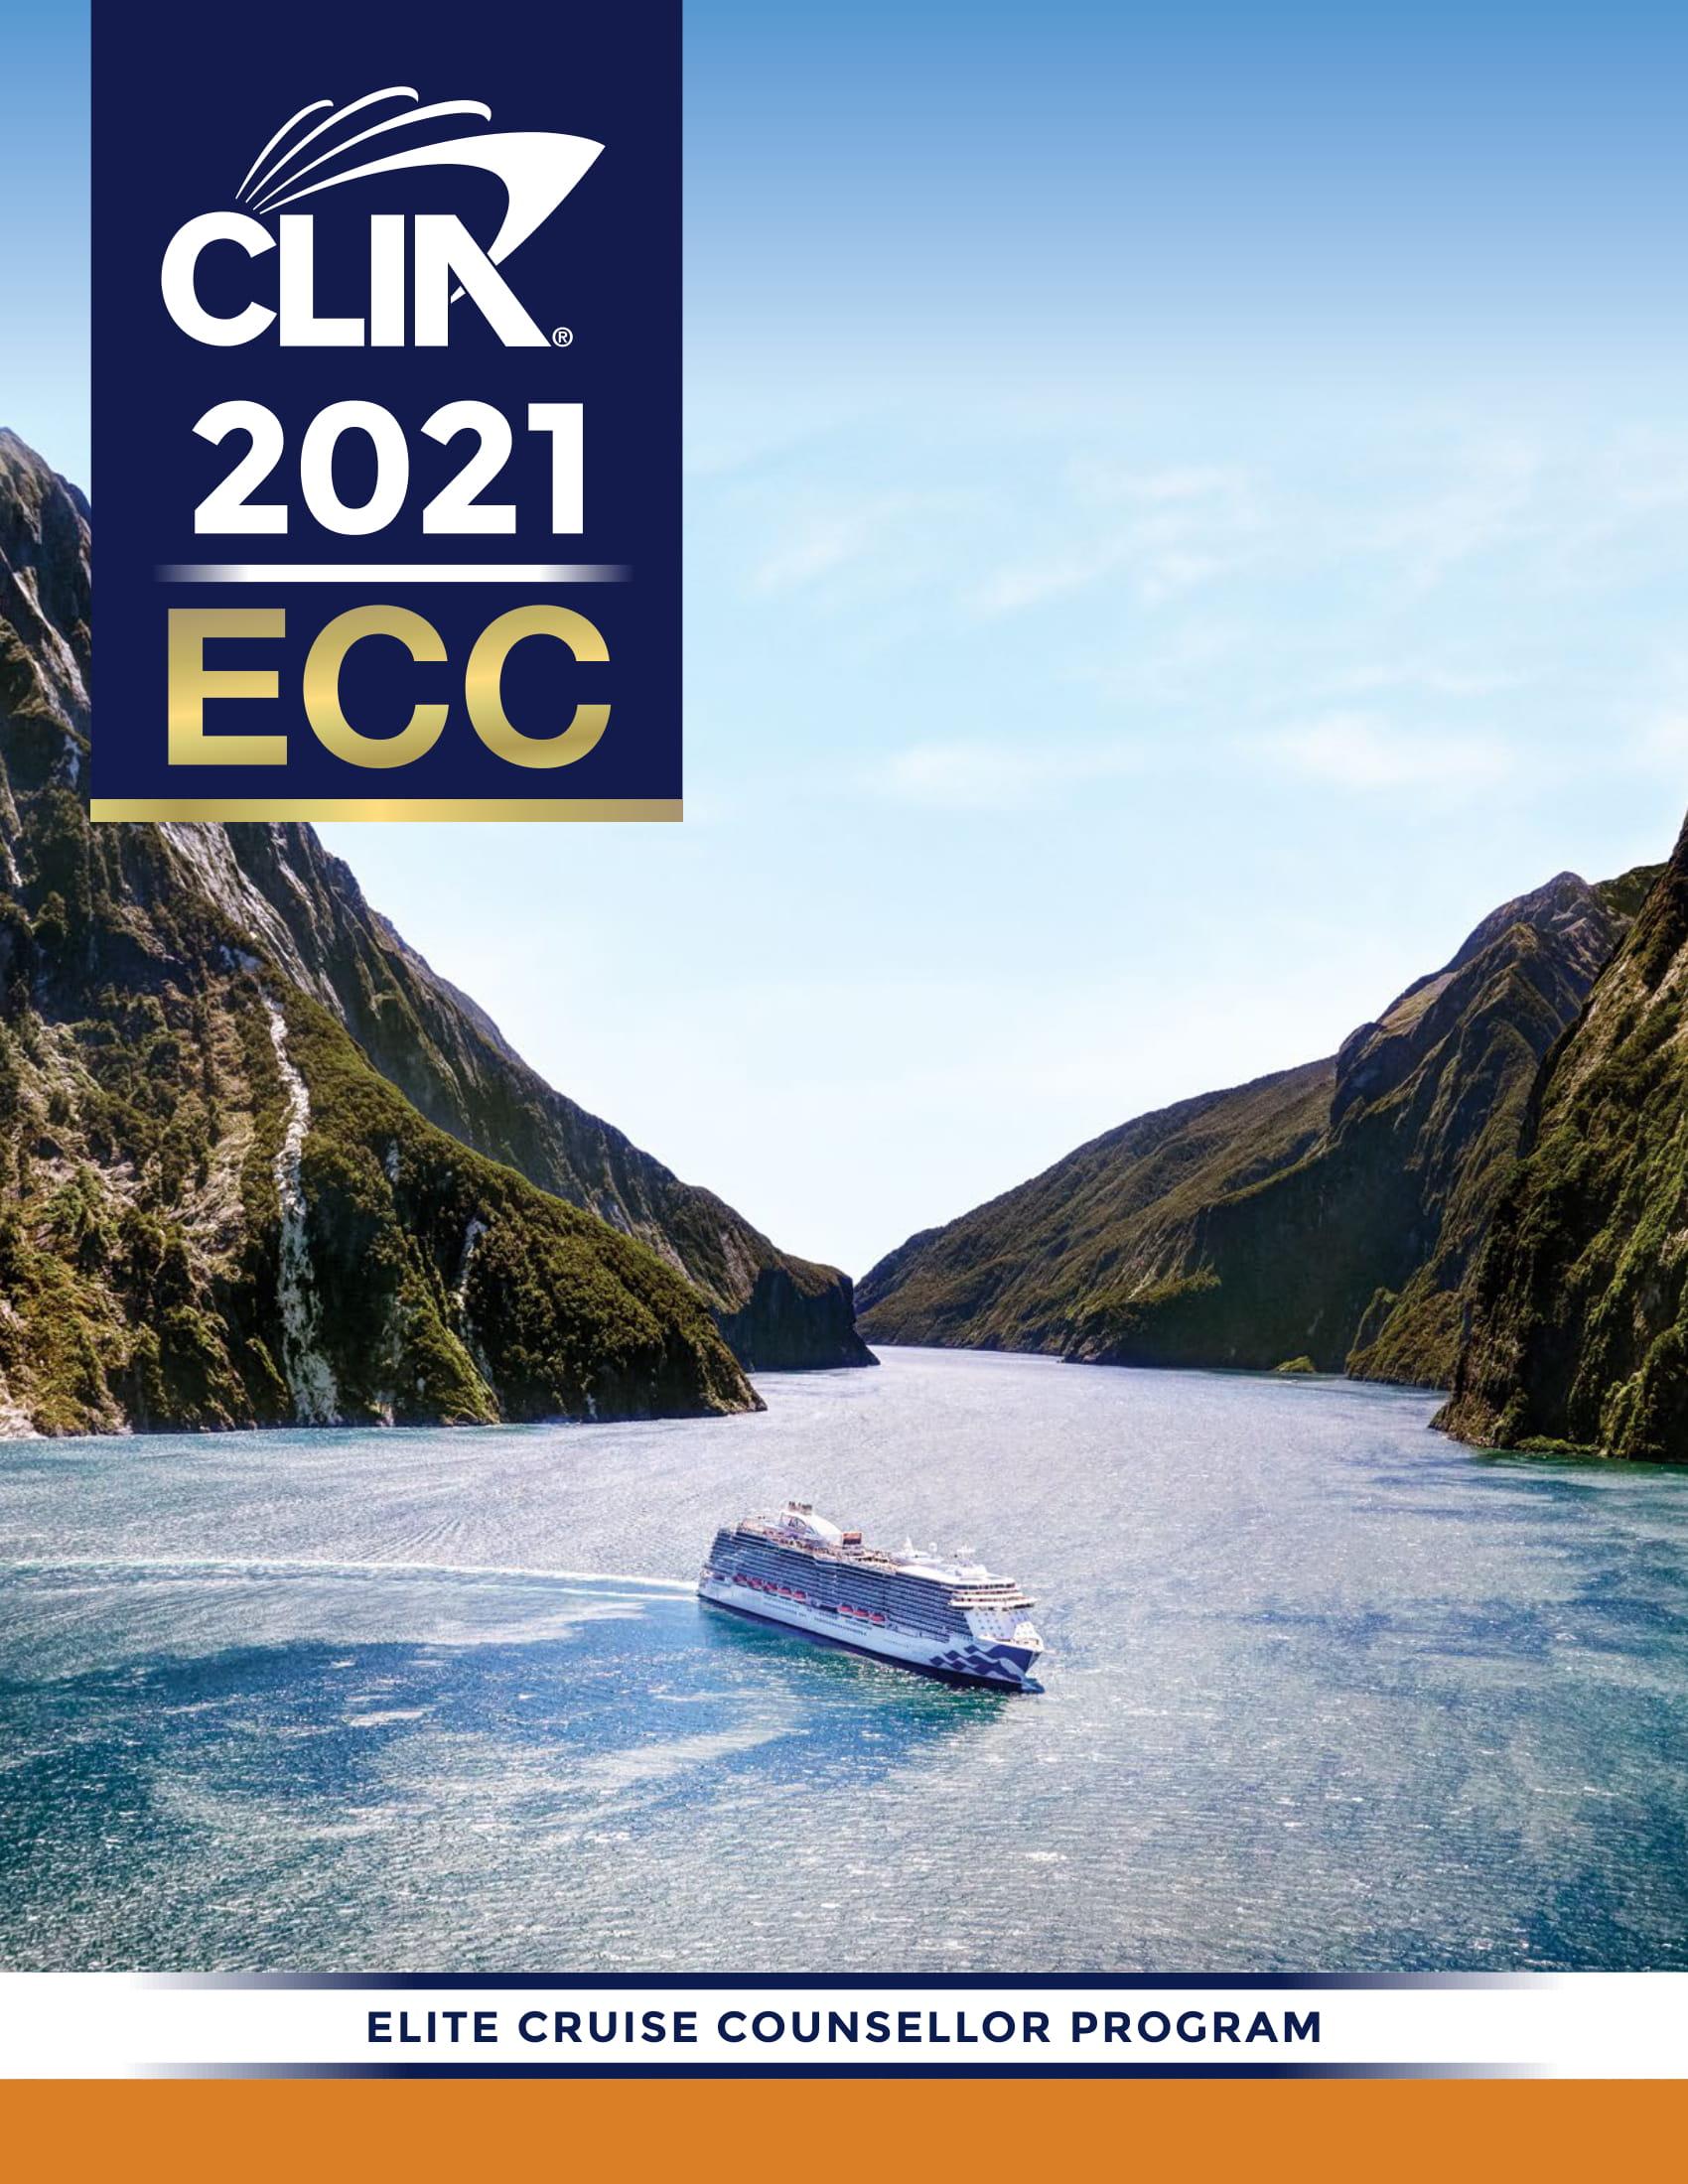 2021 Elite Cruise Counsellor Program - cliaecclogbook2021-1212020-01